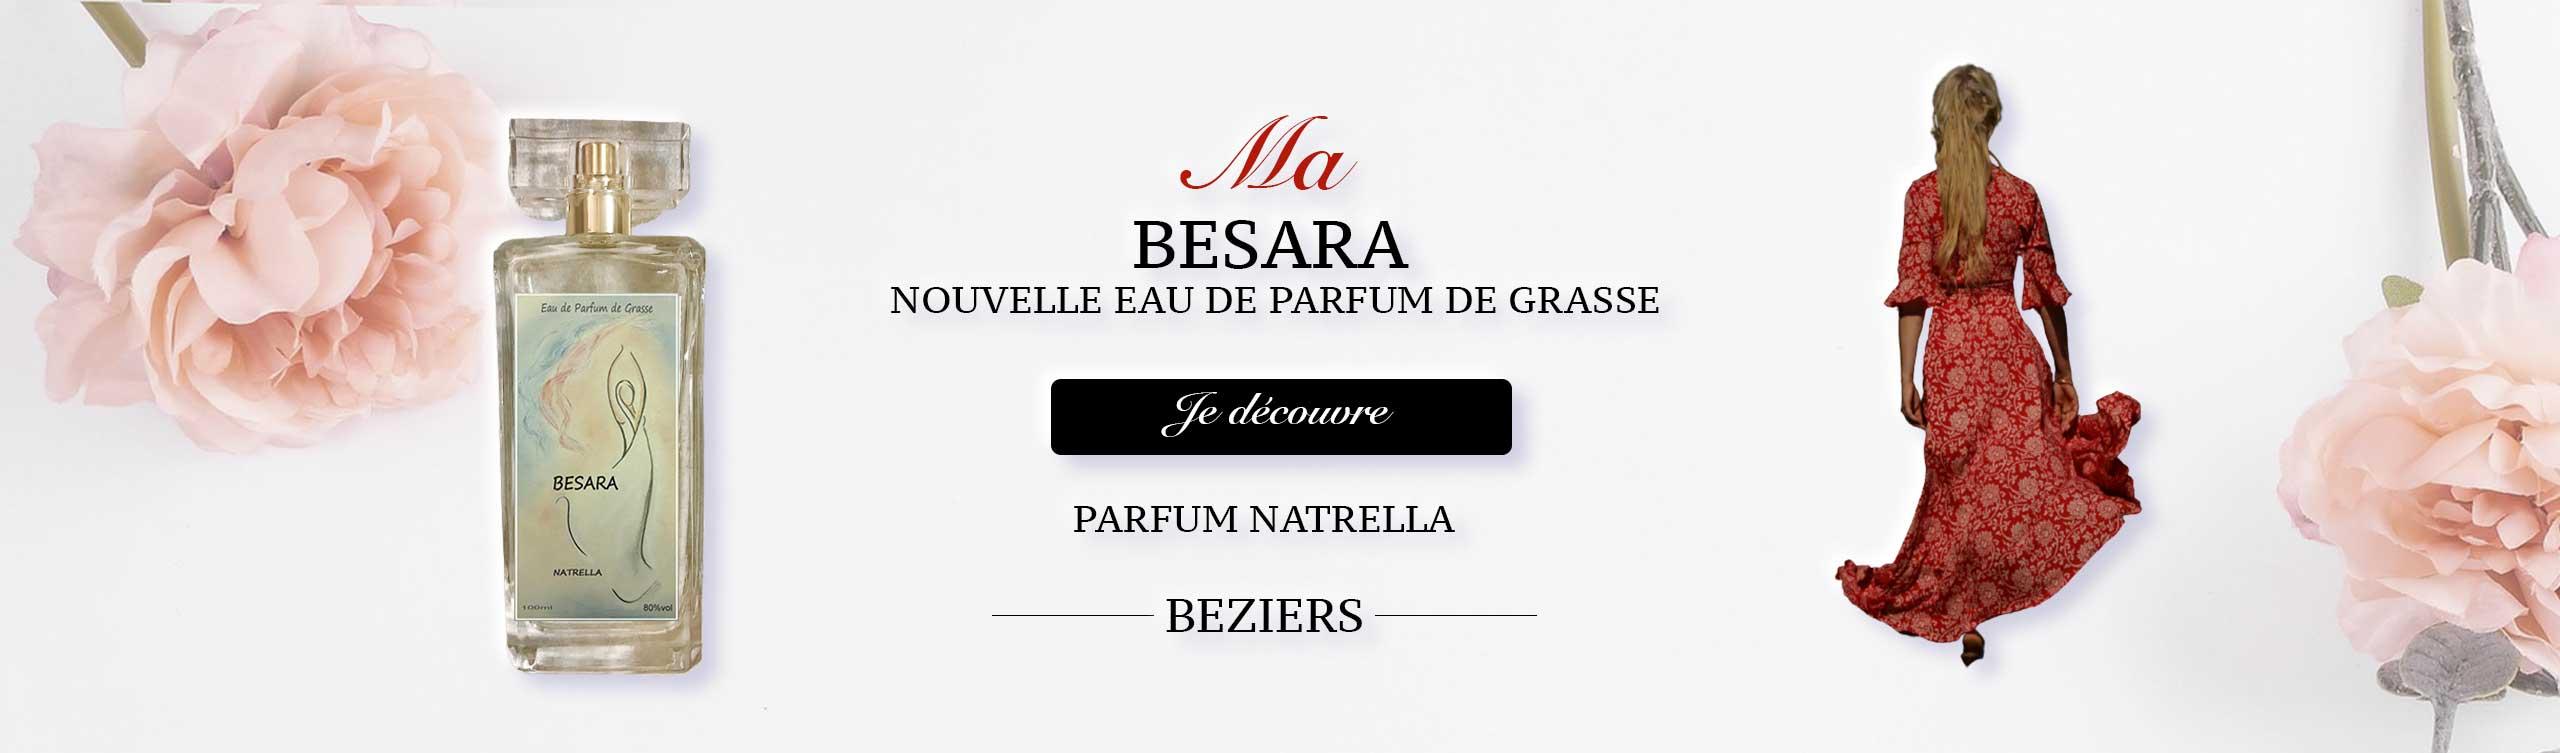 parfum BESARA